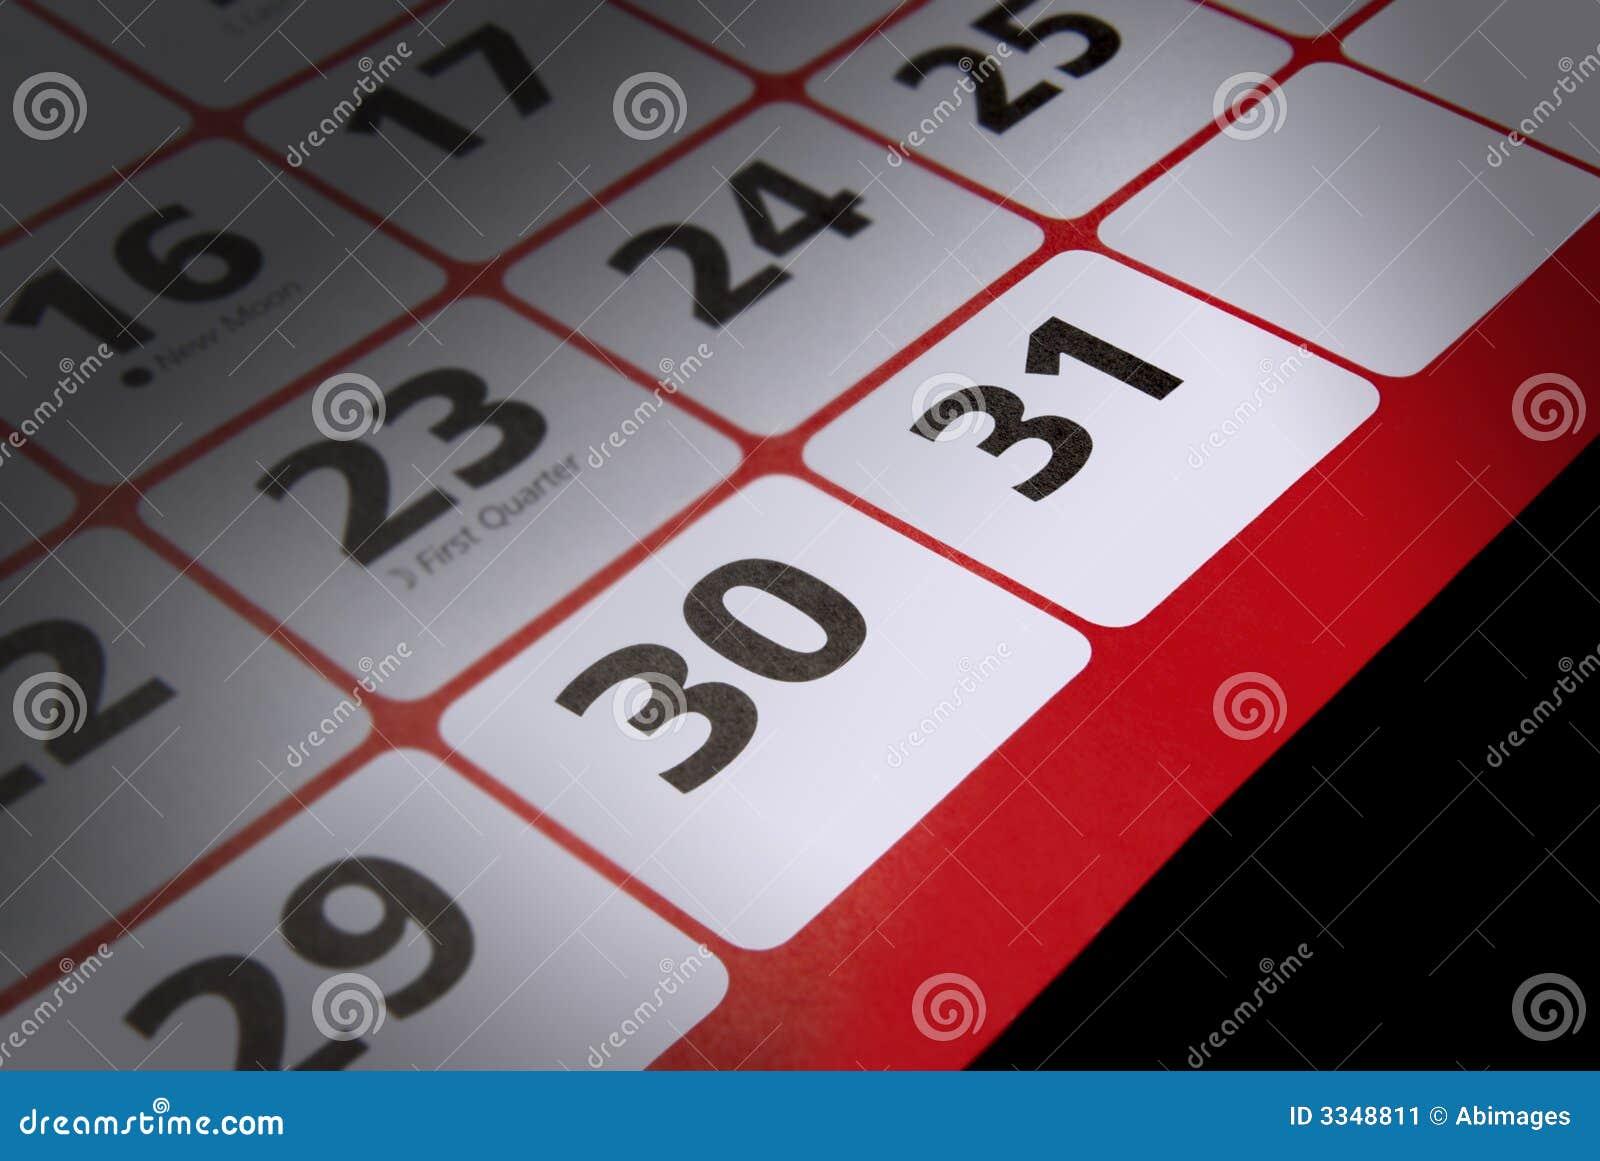 End of month deadline